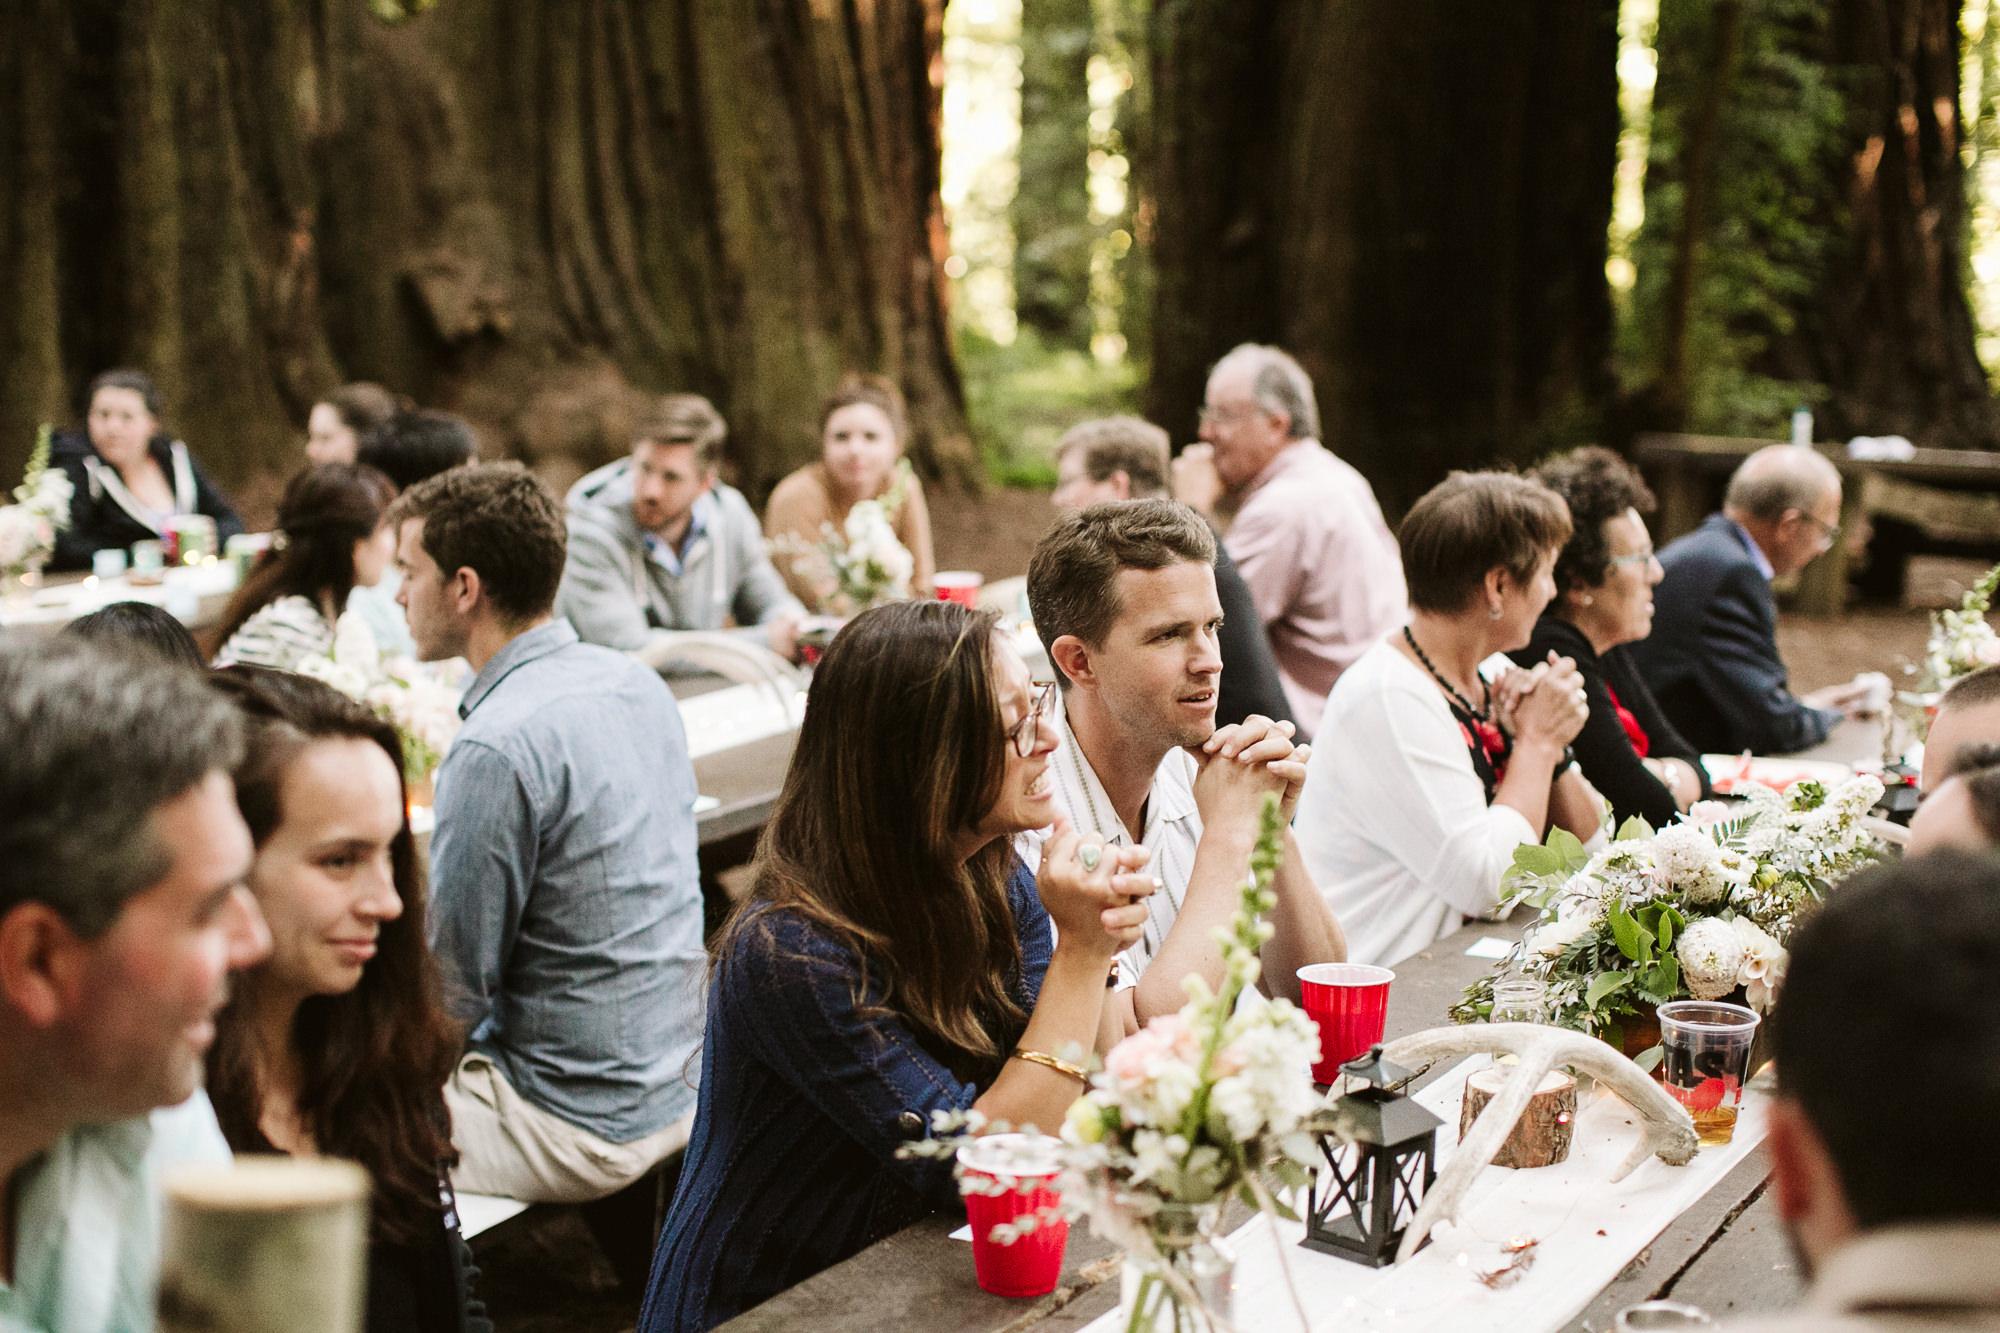 California-wedding-photographer-alfonso-flores-pamplin-groove-307.jpg